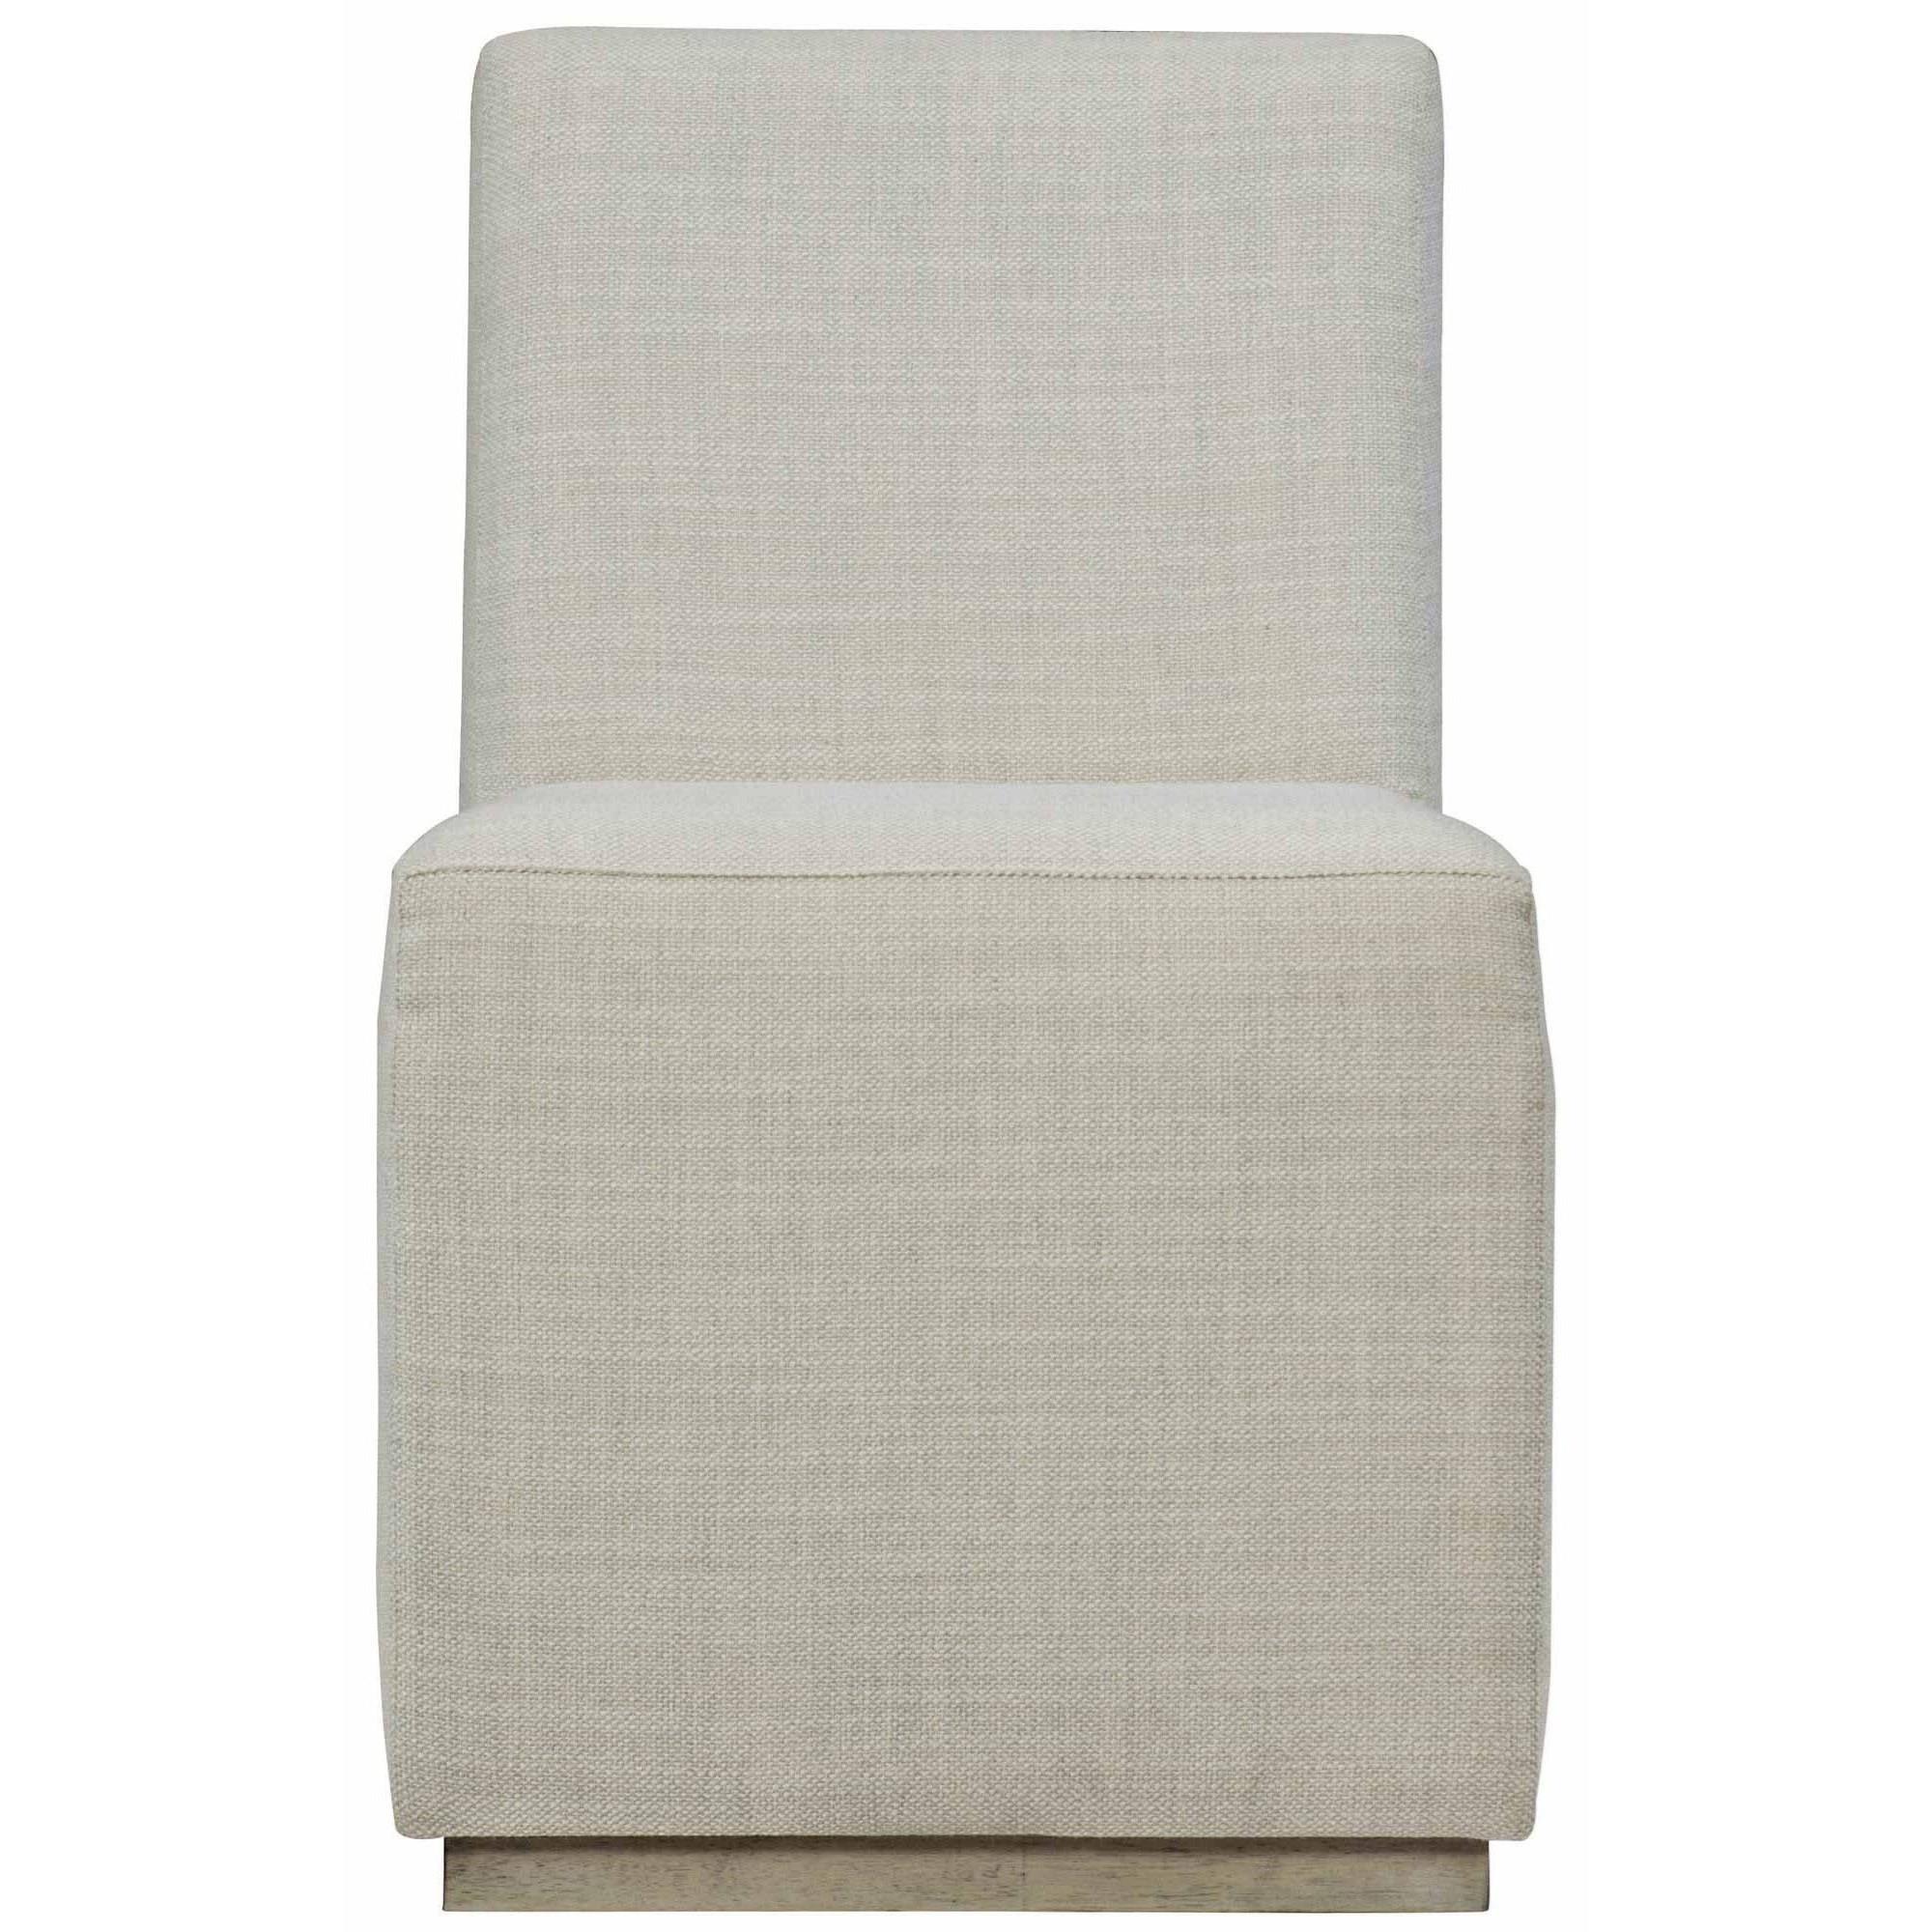 Loft - Highland Park Casey Upholstered Dining Side Chair by Bernhardt at Baer's Furniture